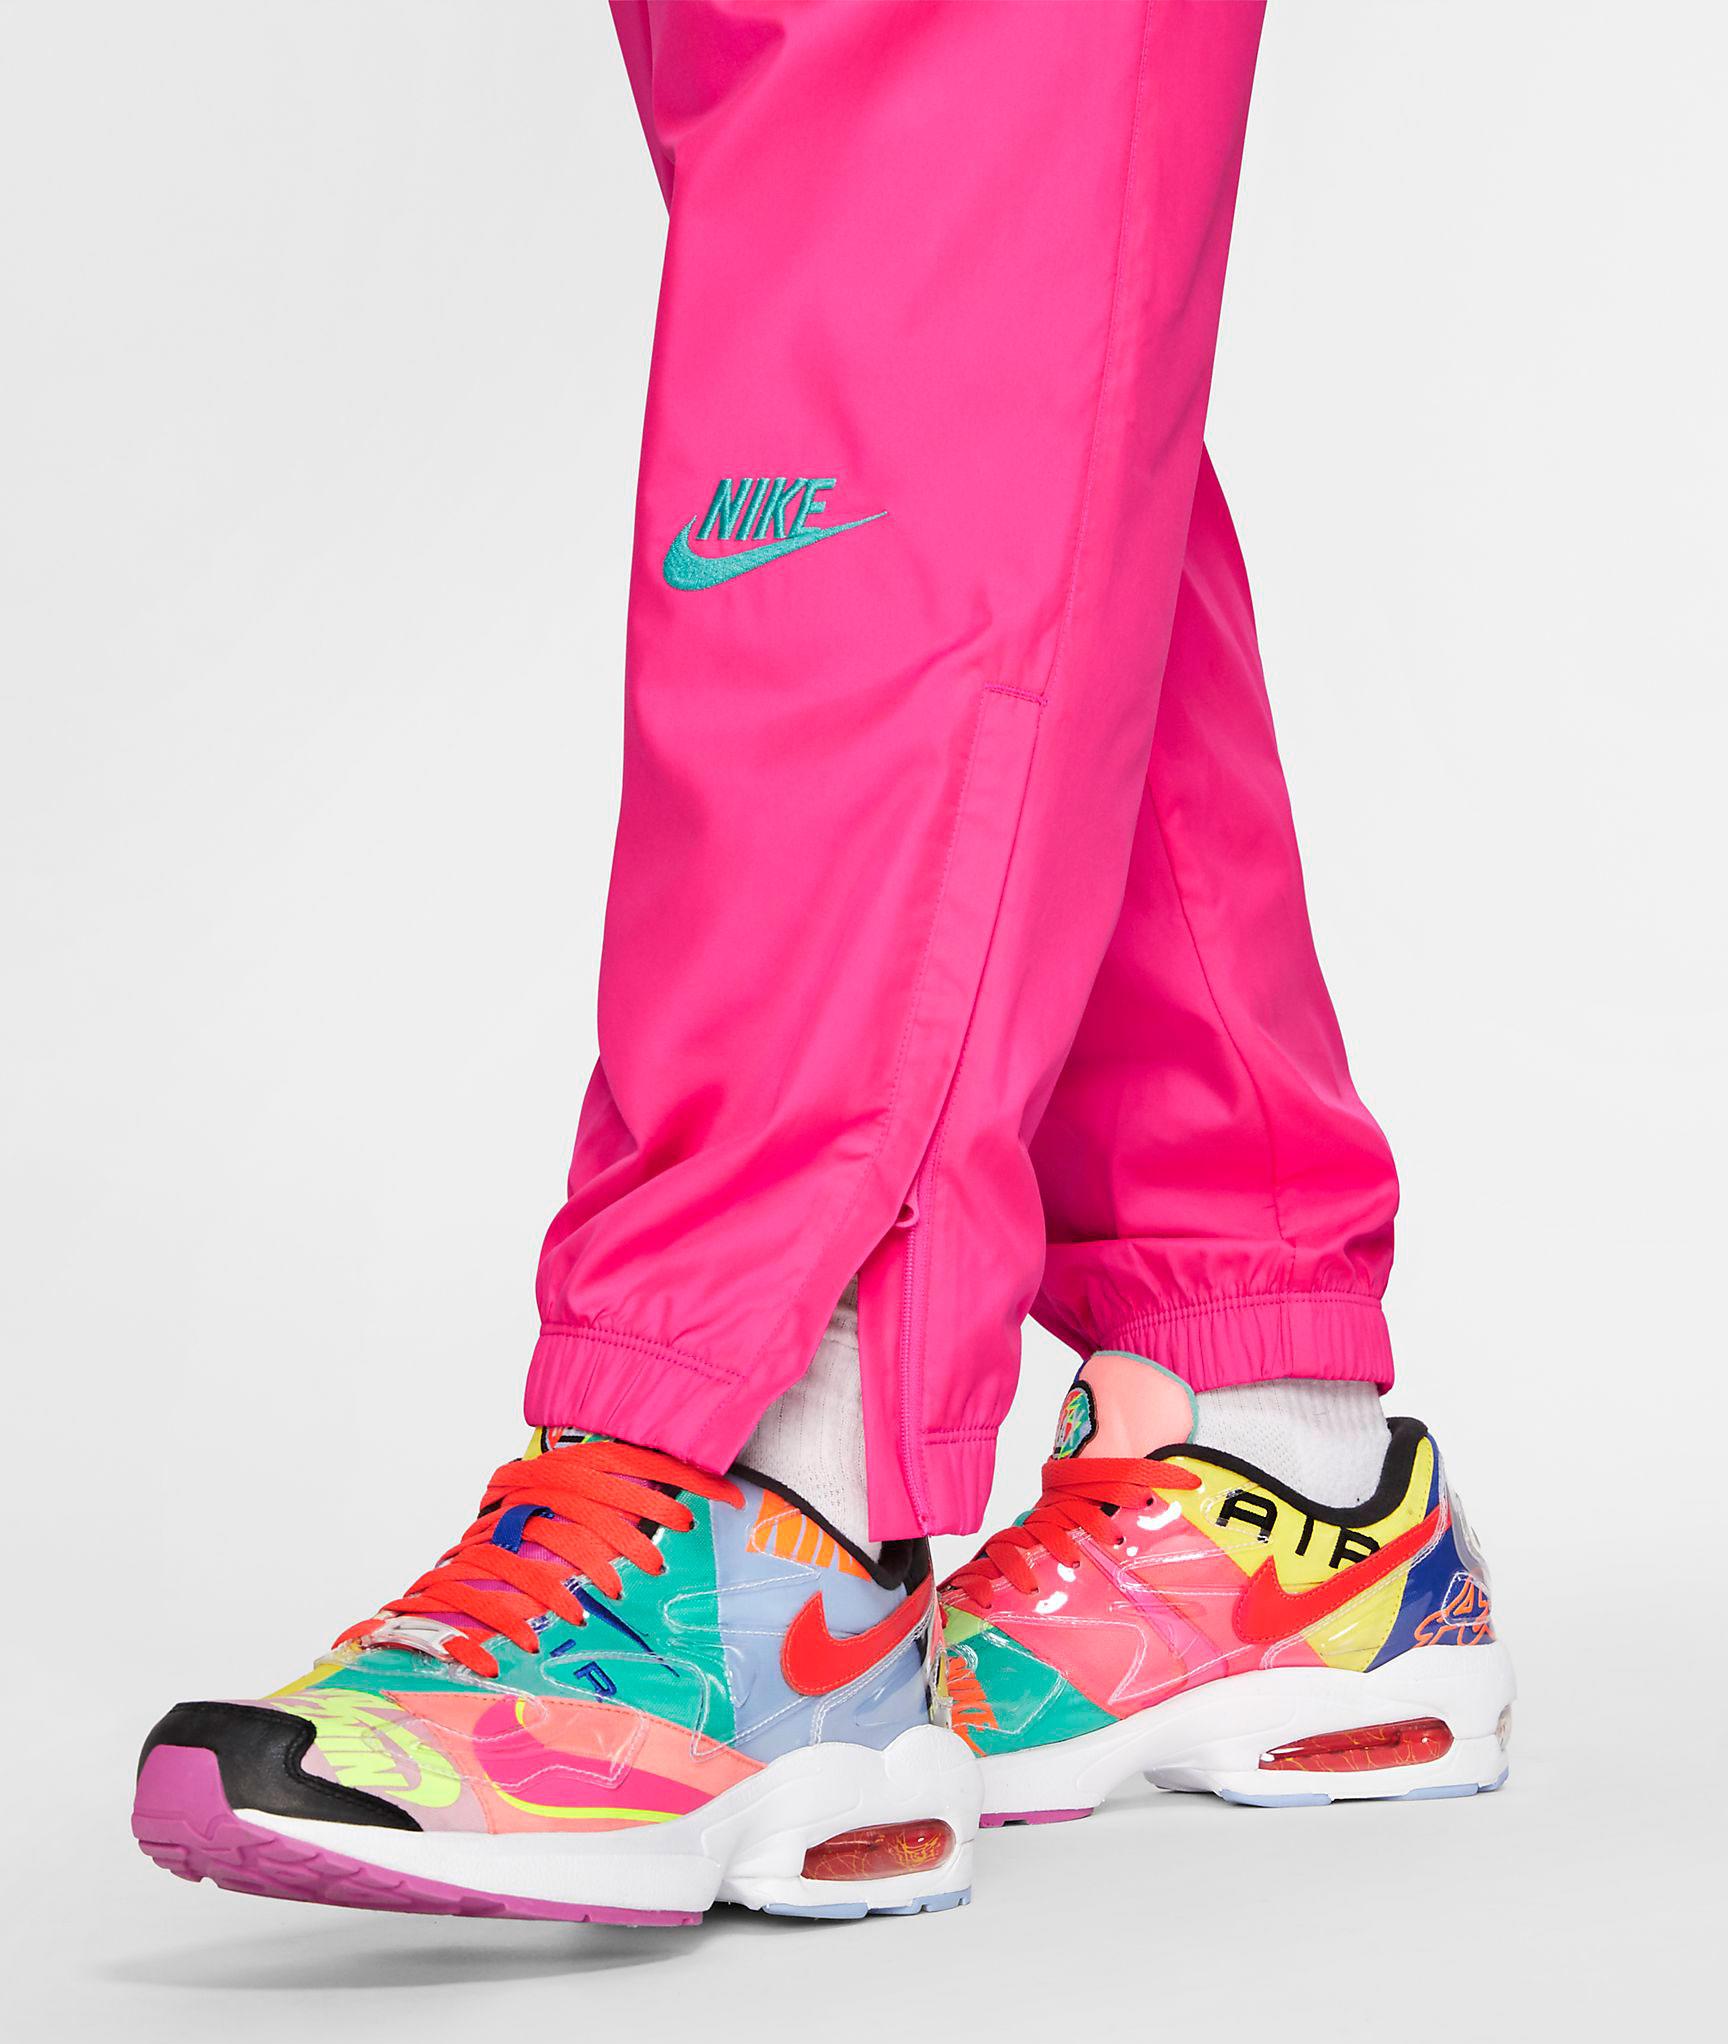 atmos-nike-air-max-2-light-pants-pink-2